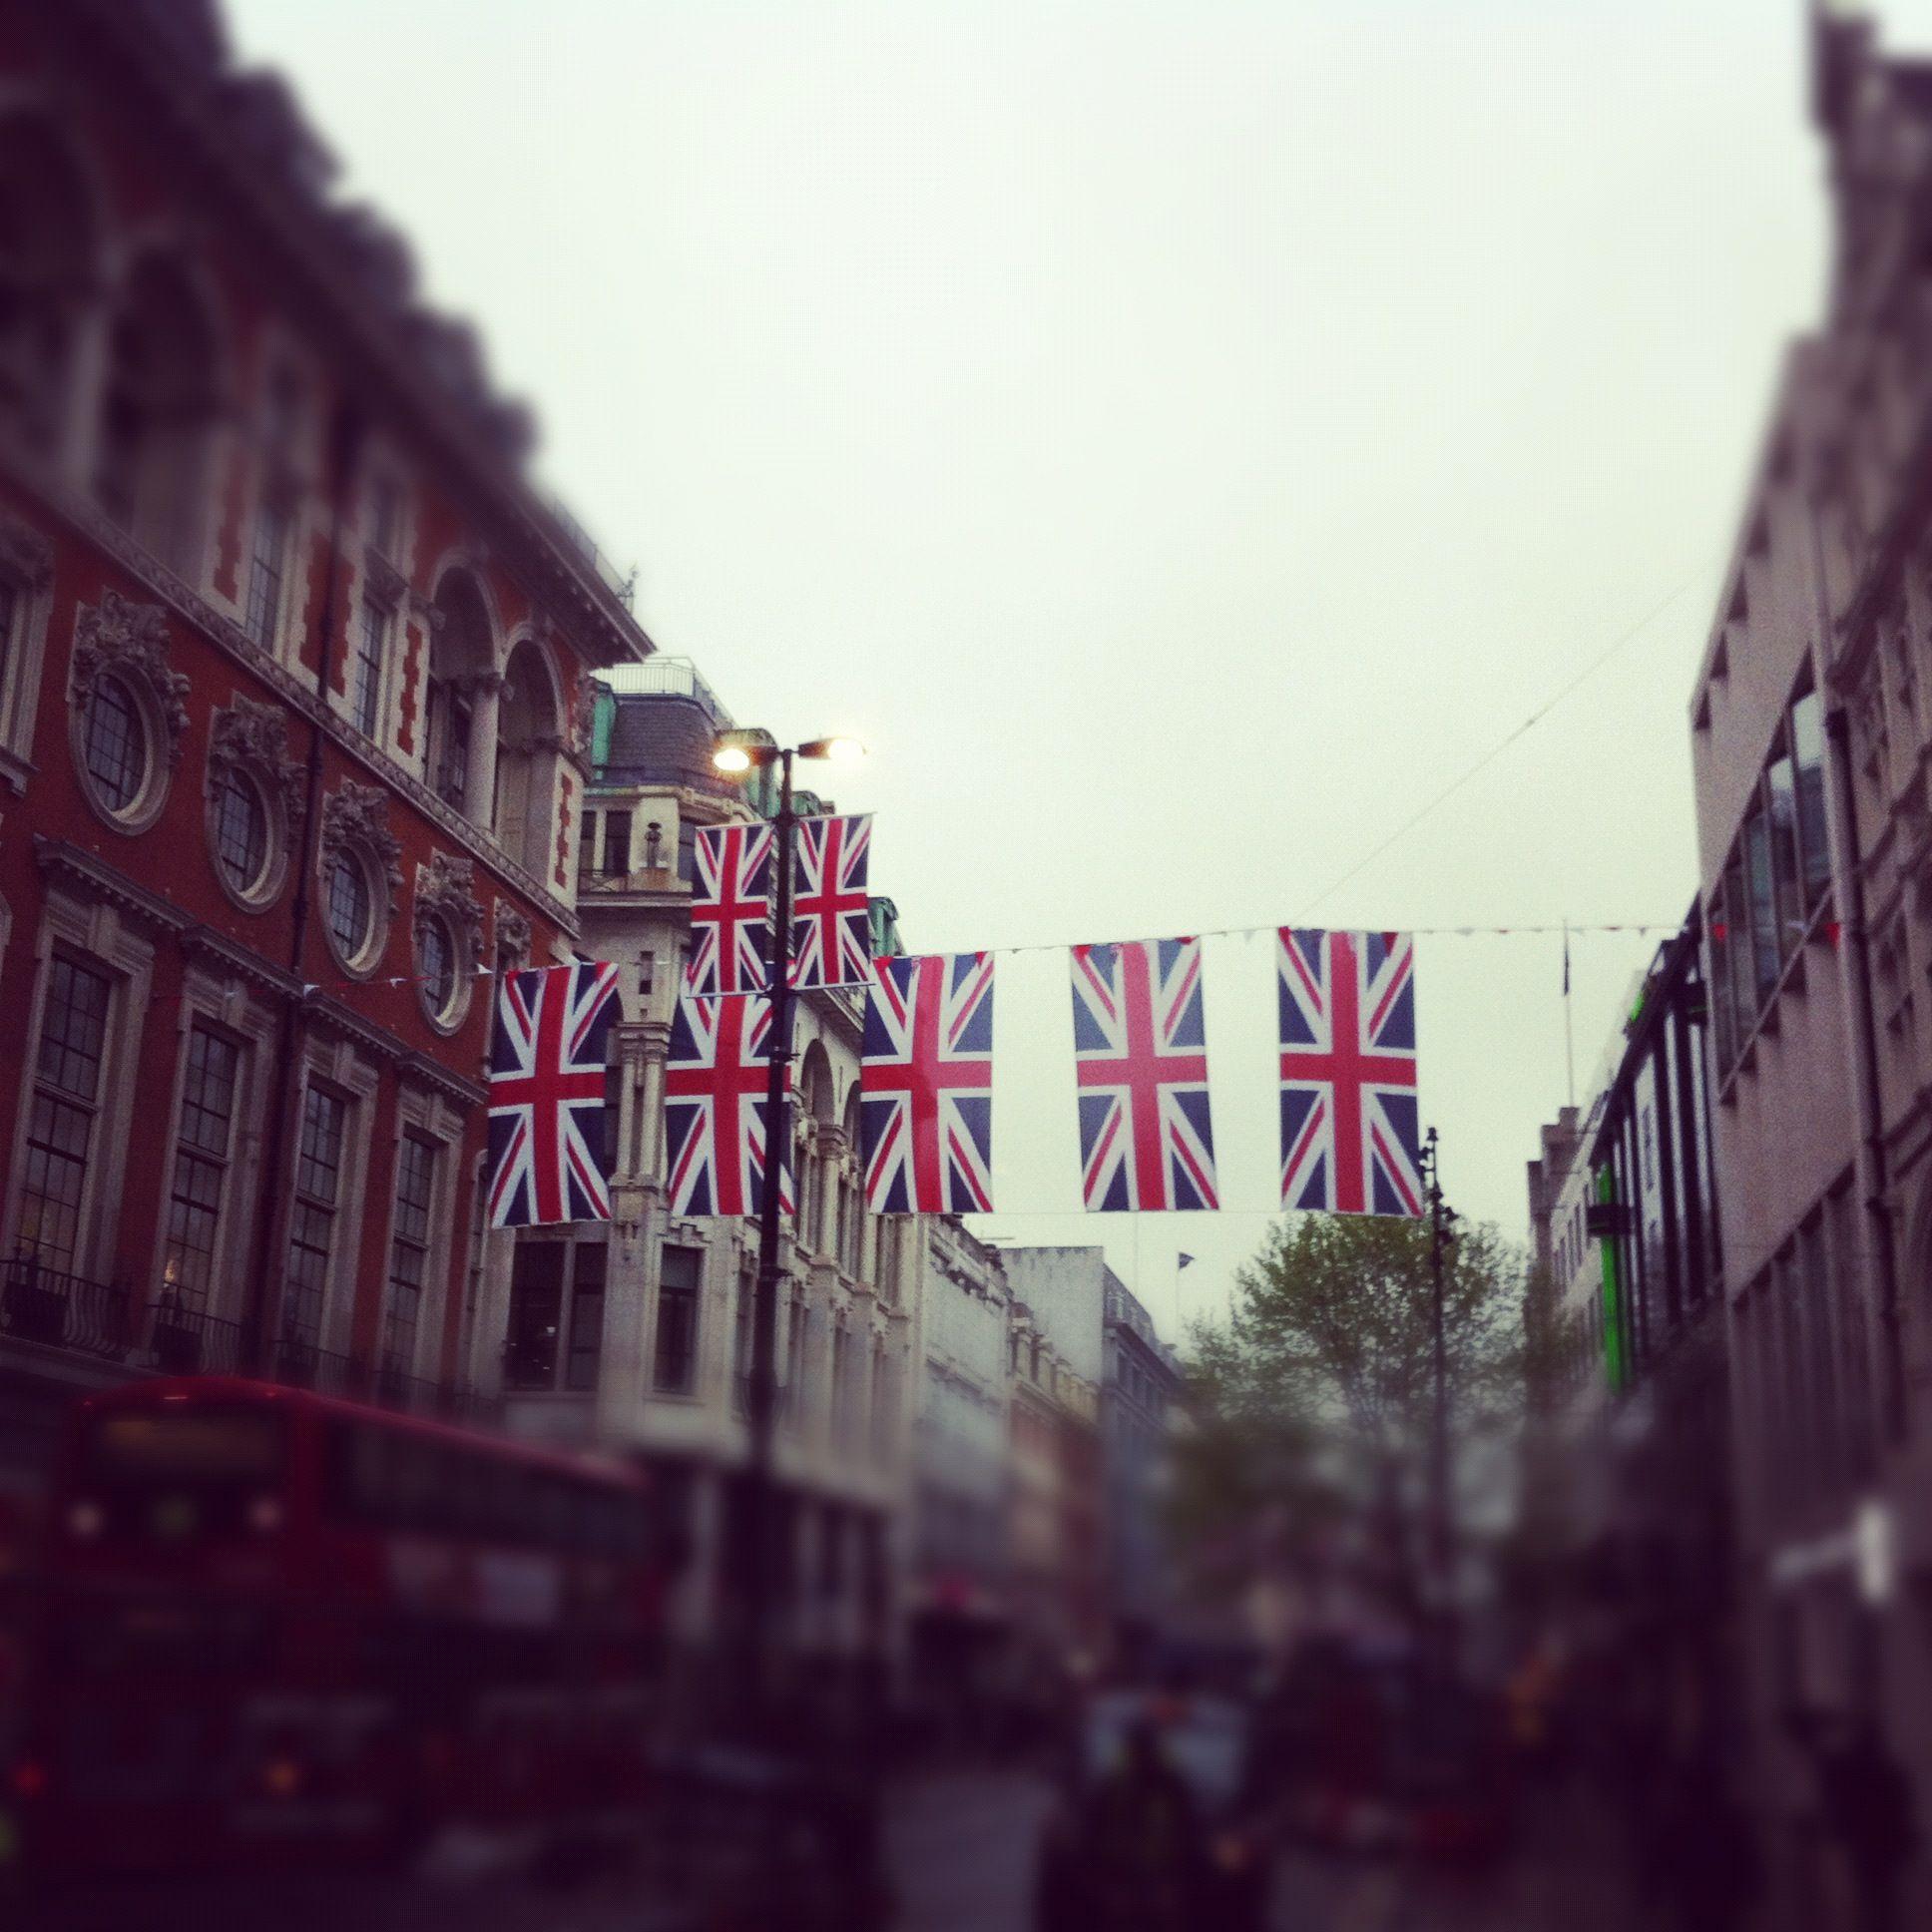 flags on regent street